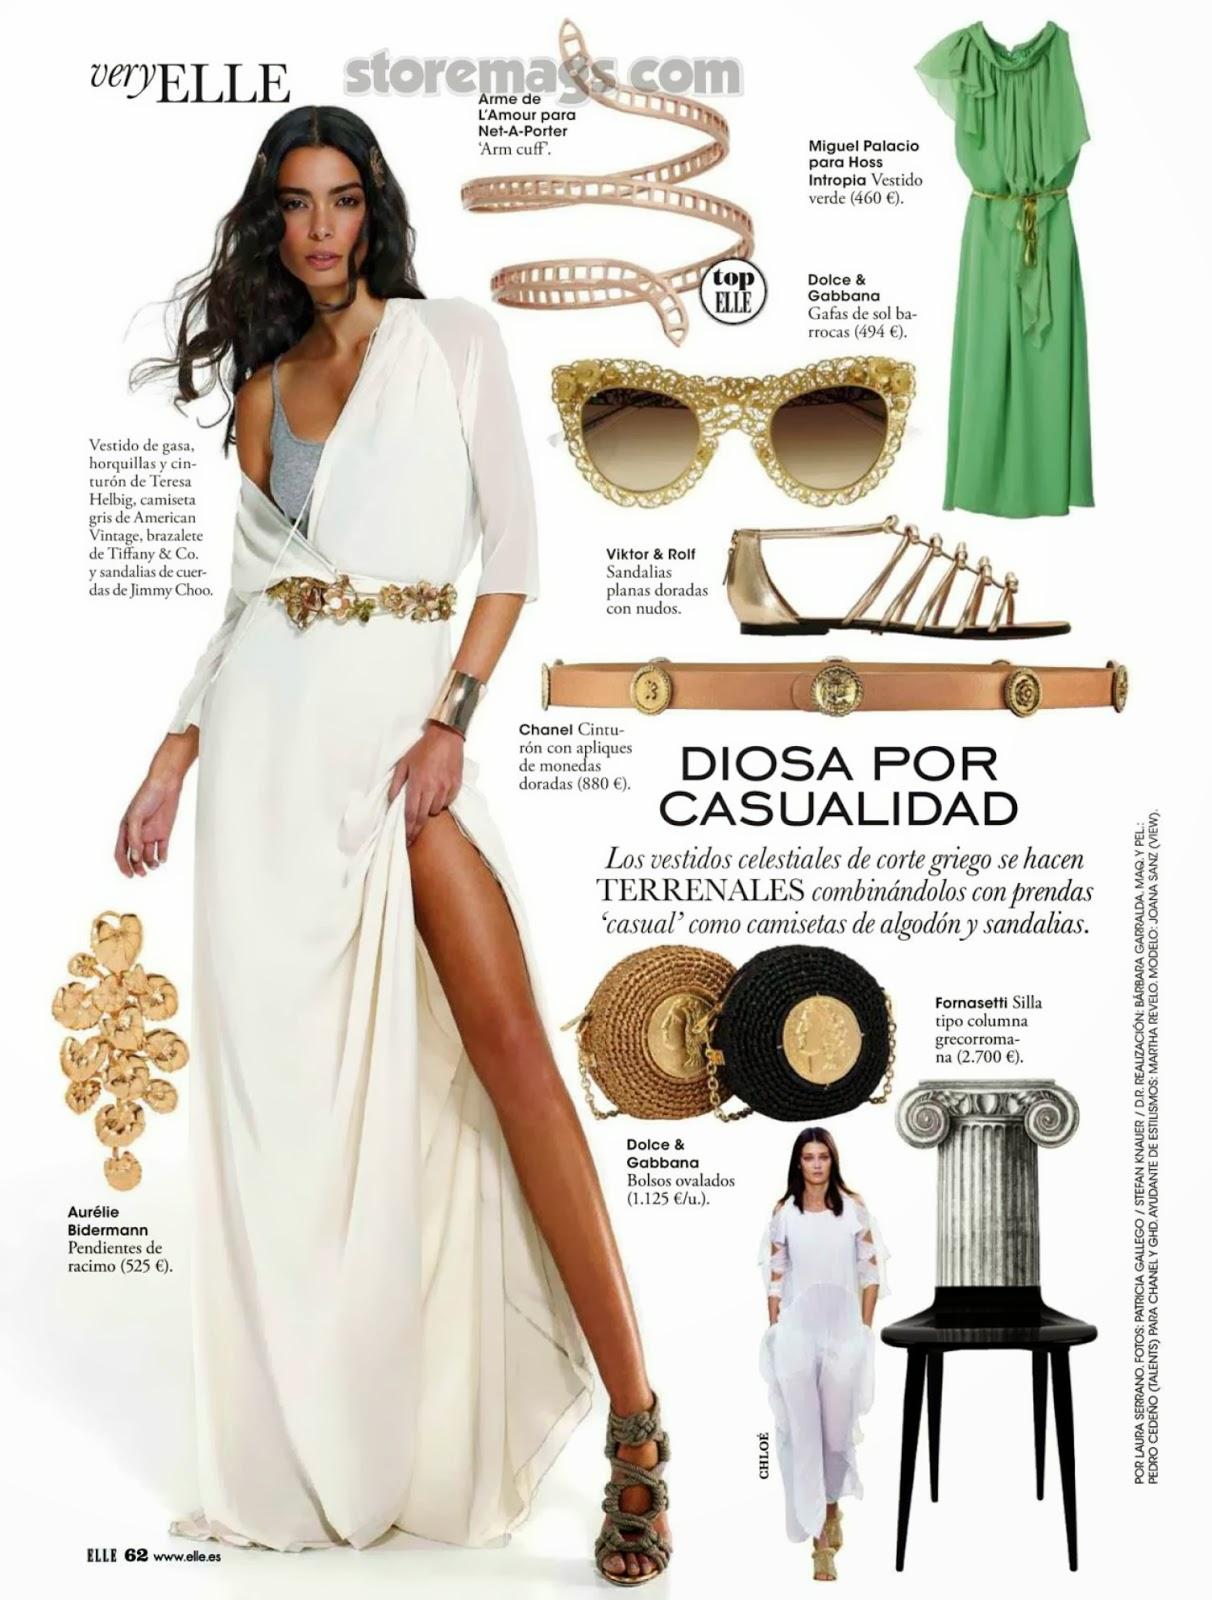 Joana Sanz HQ Pictures Elle Spain Magazine Photoshoot March 2014